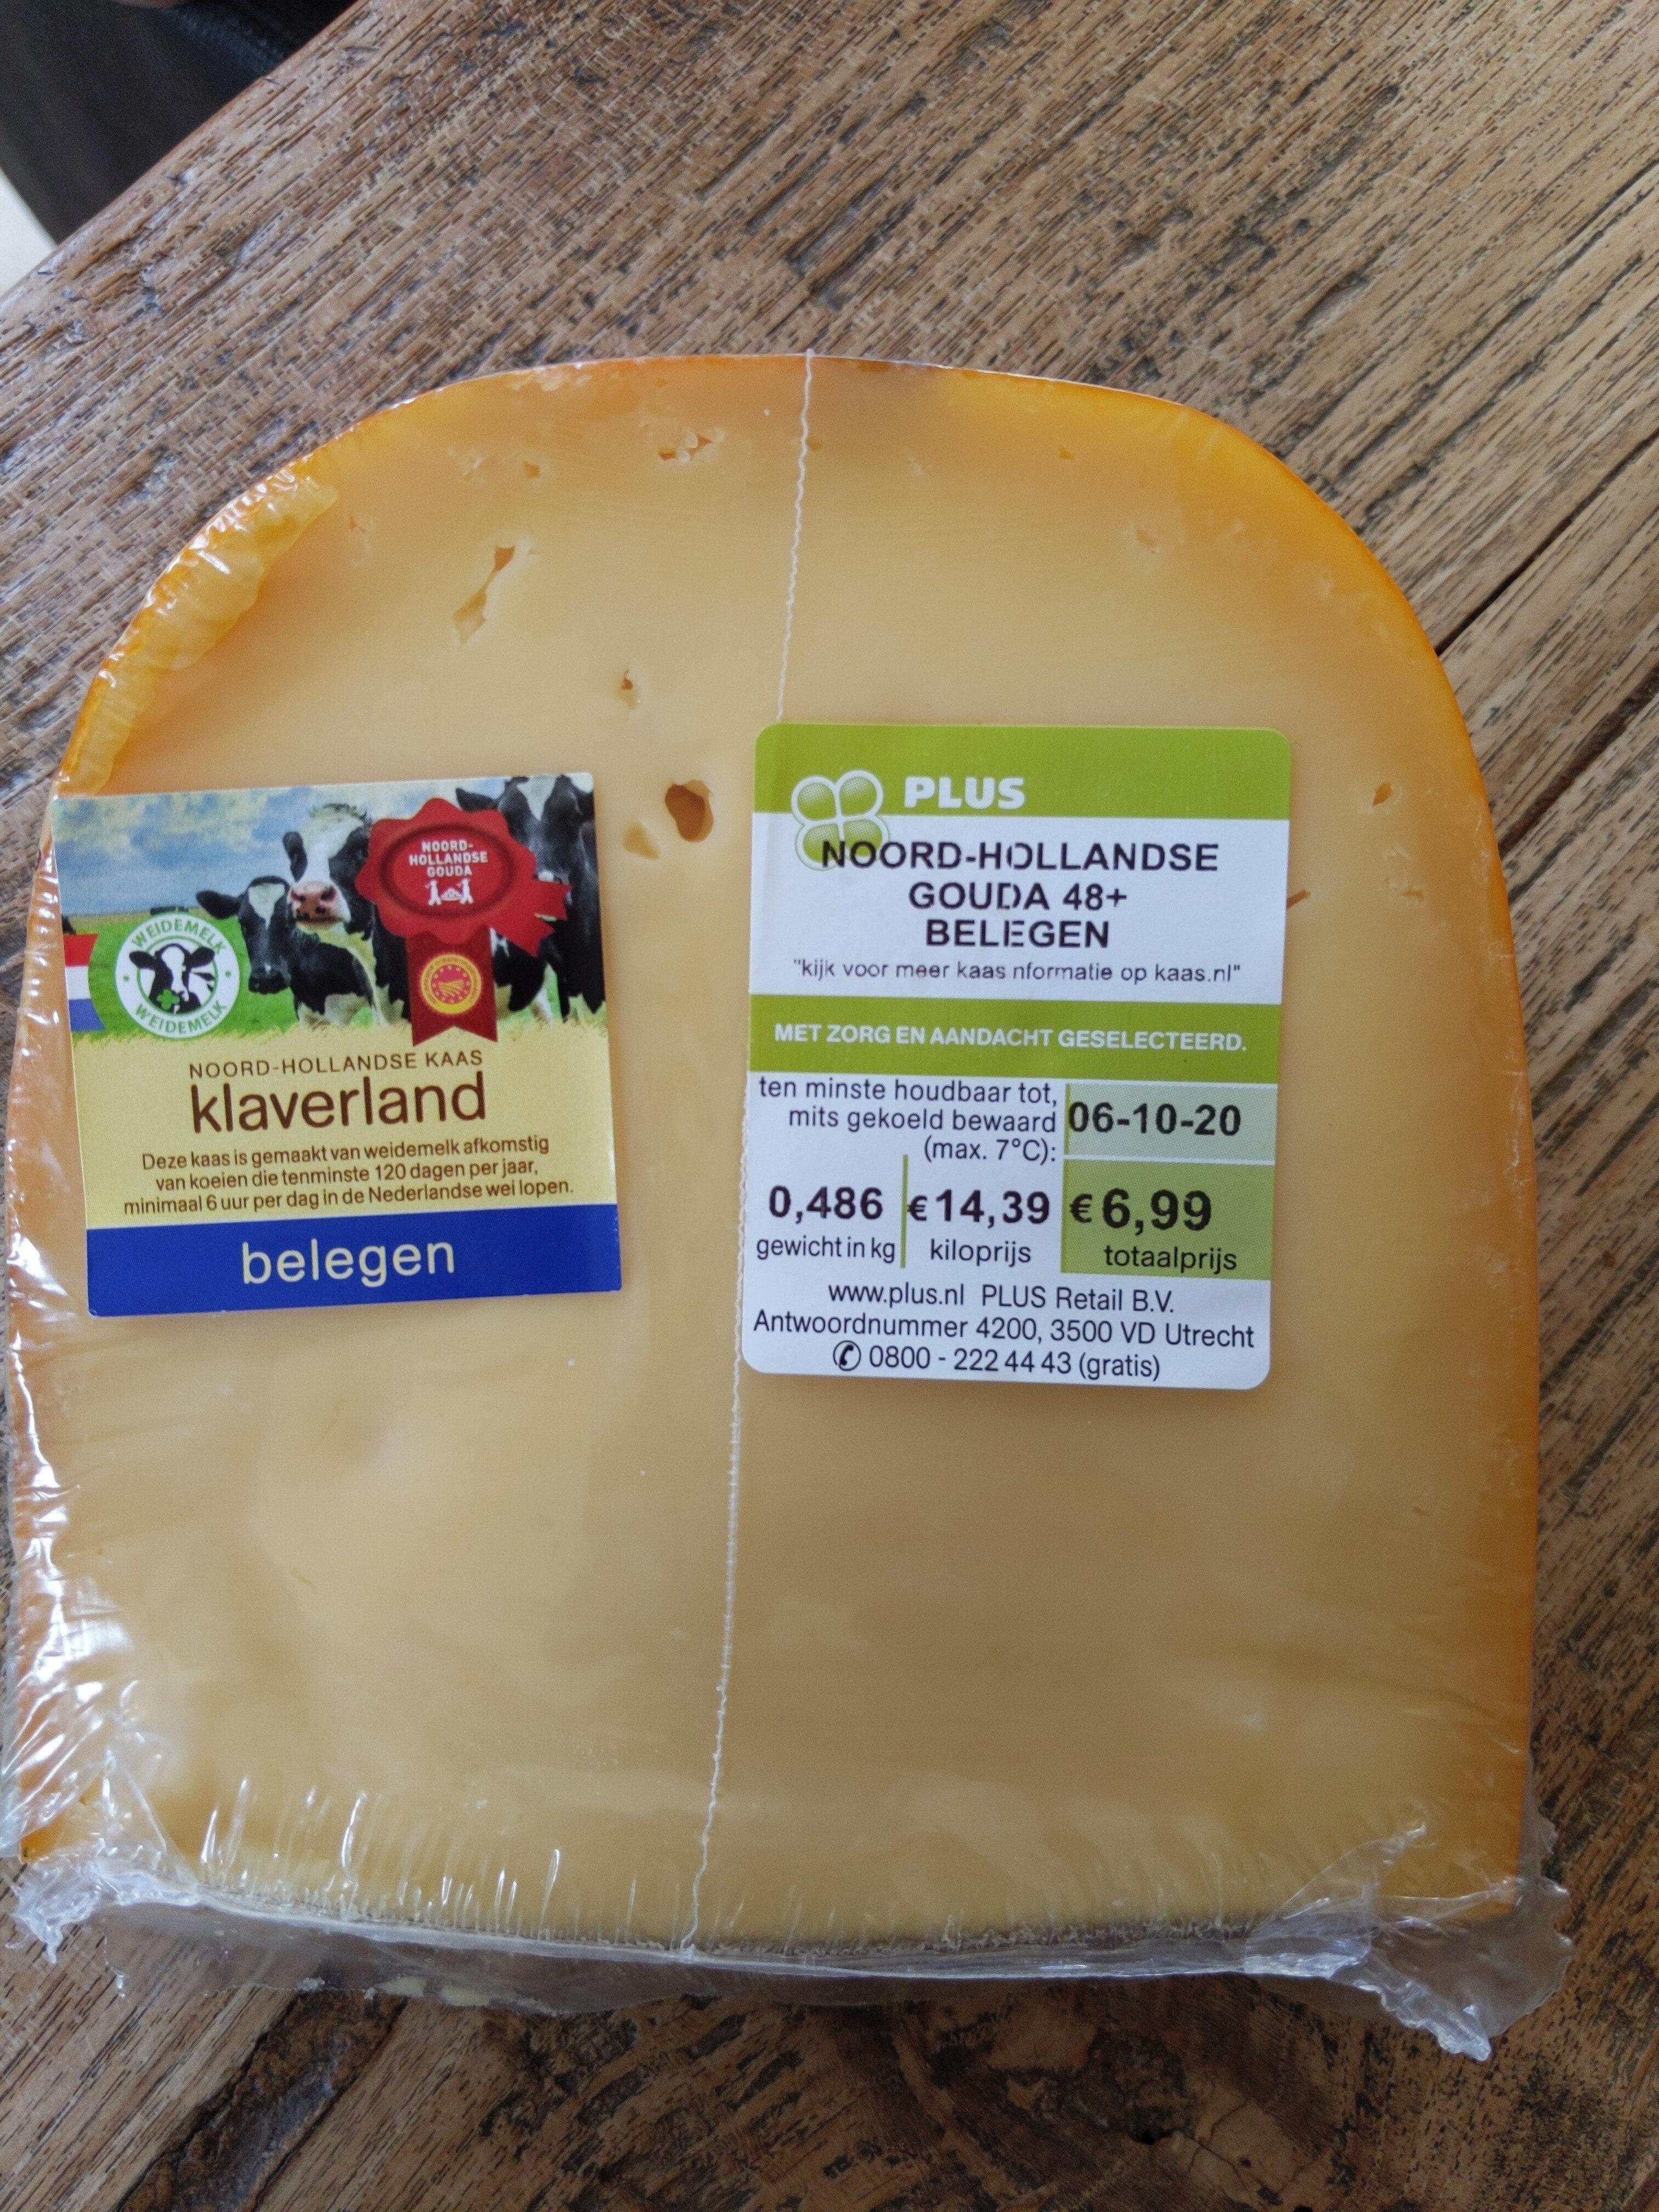 noord-hollandse Gouda 48+ belegen - Product - nl